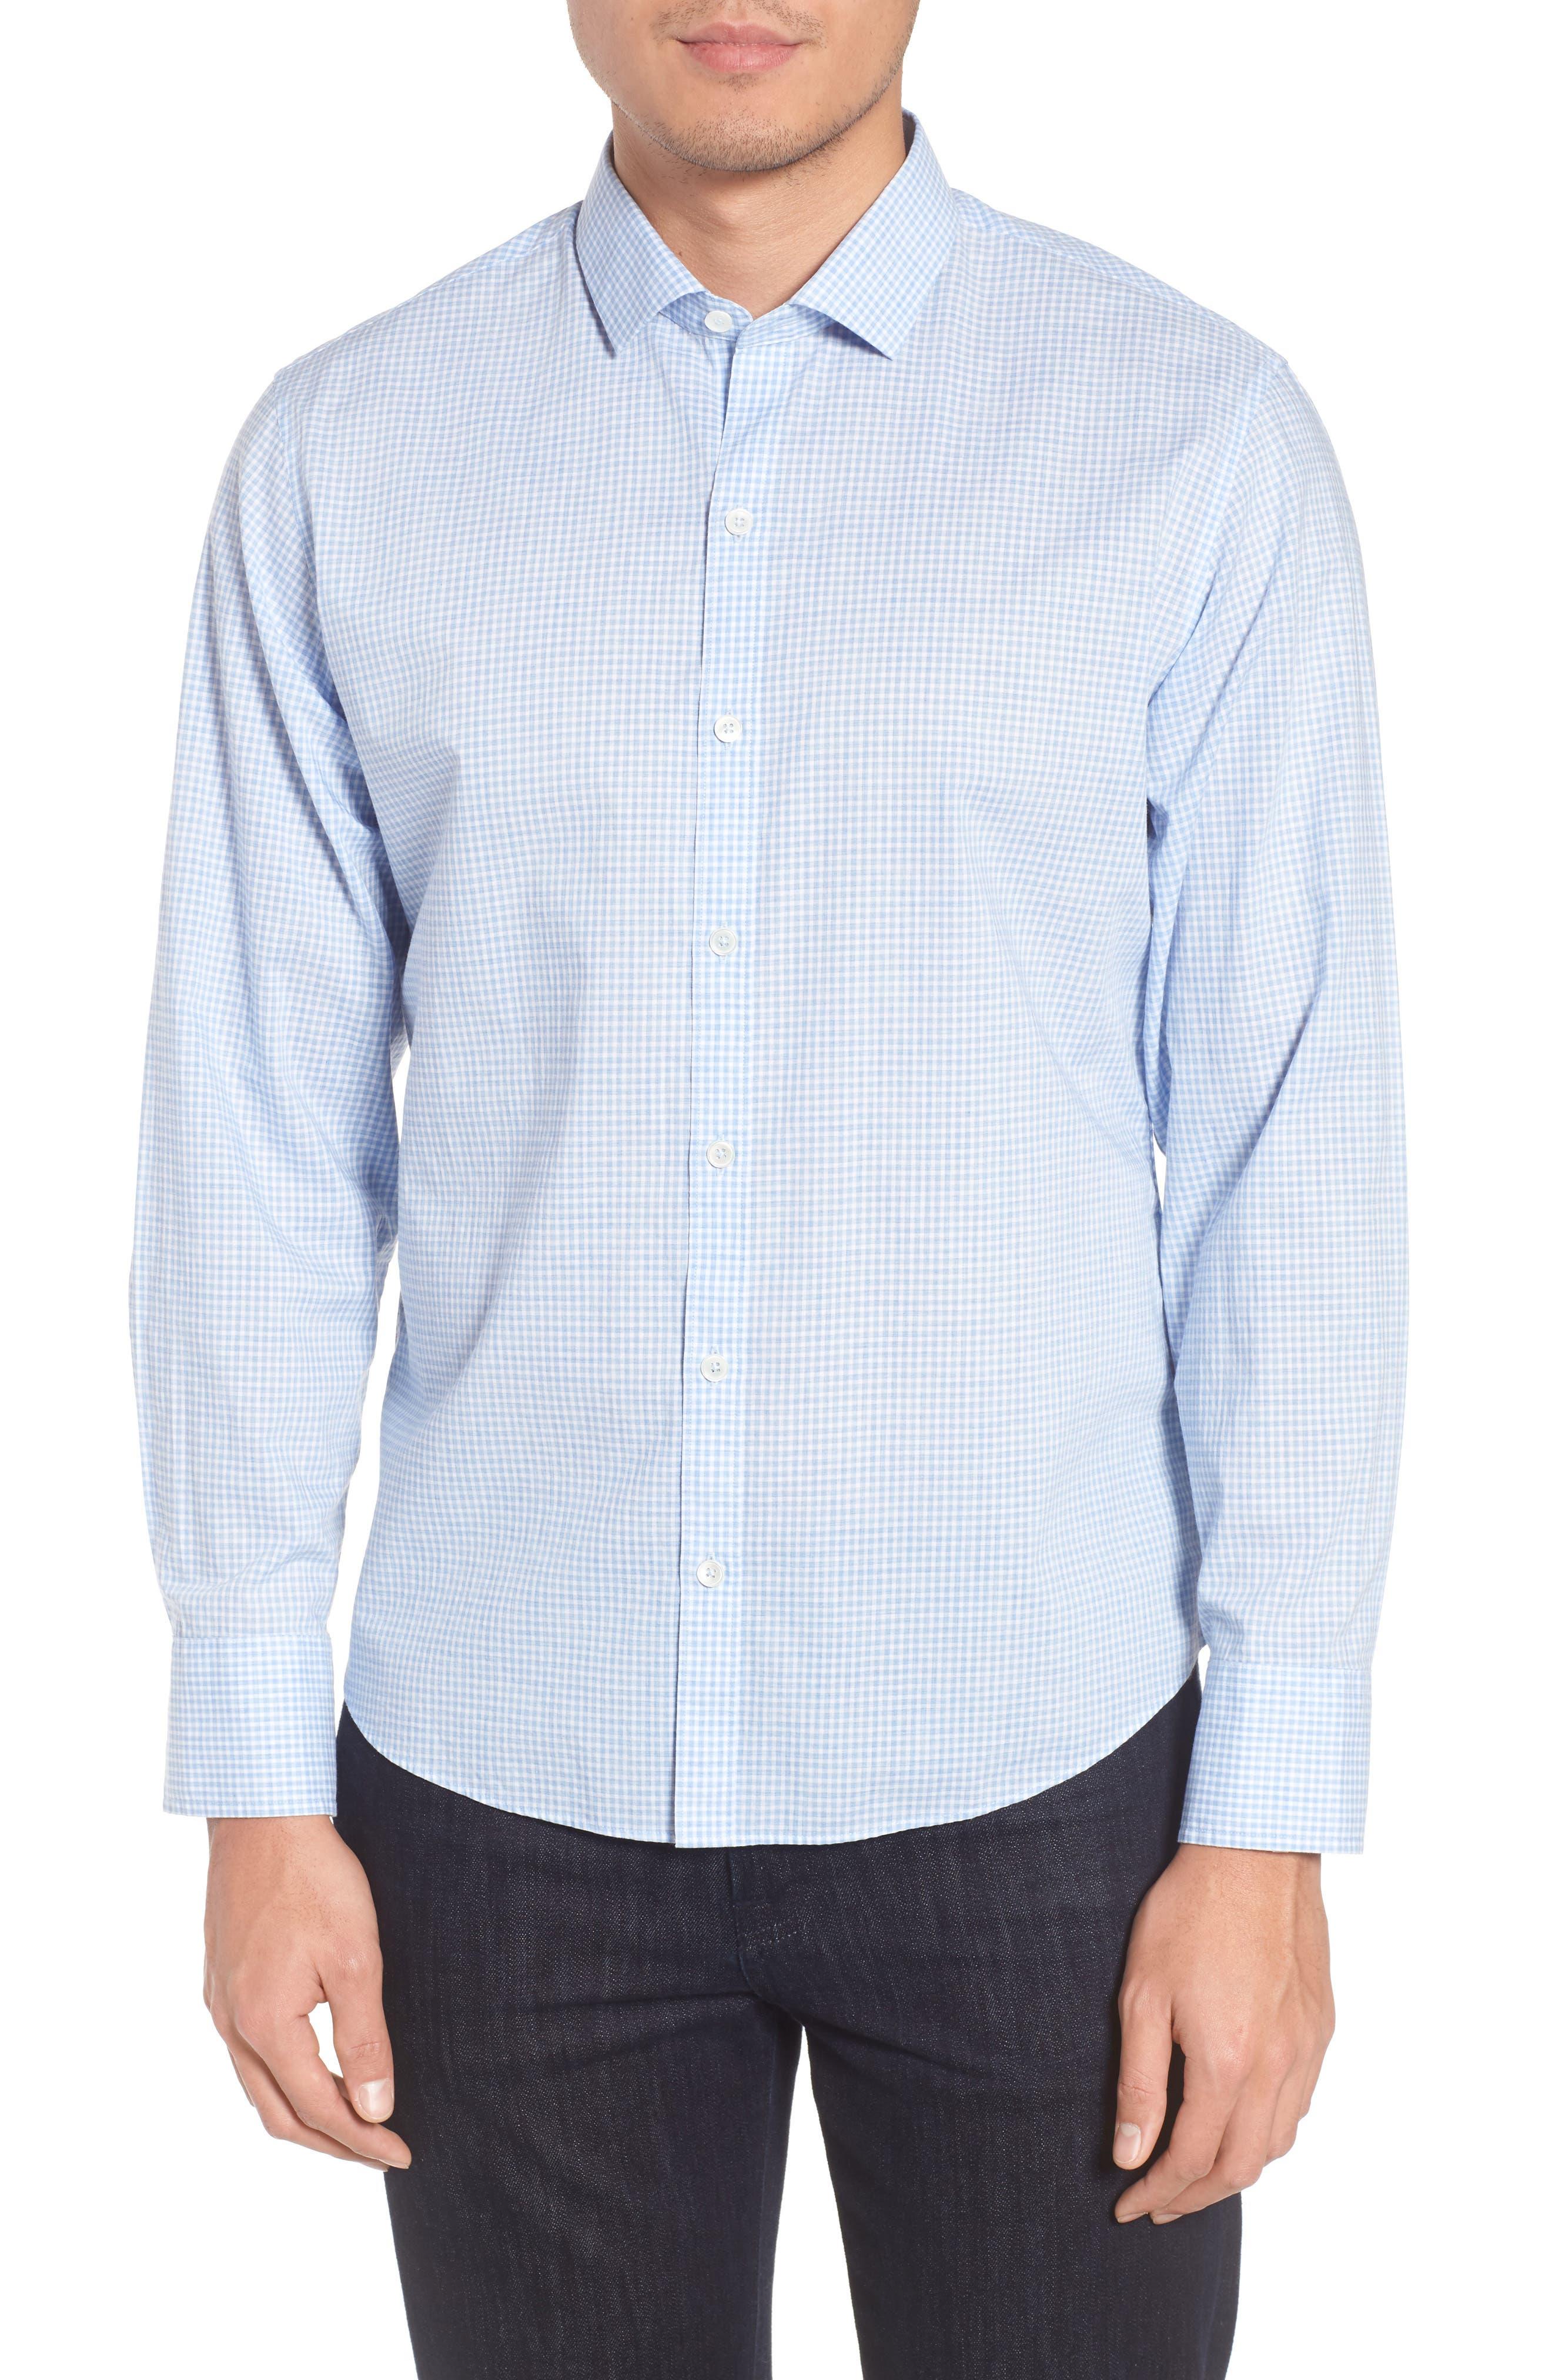 McGarry Gingham Sport Shirt,                         Main,                         color, 450